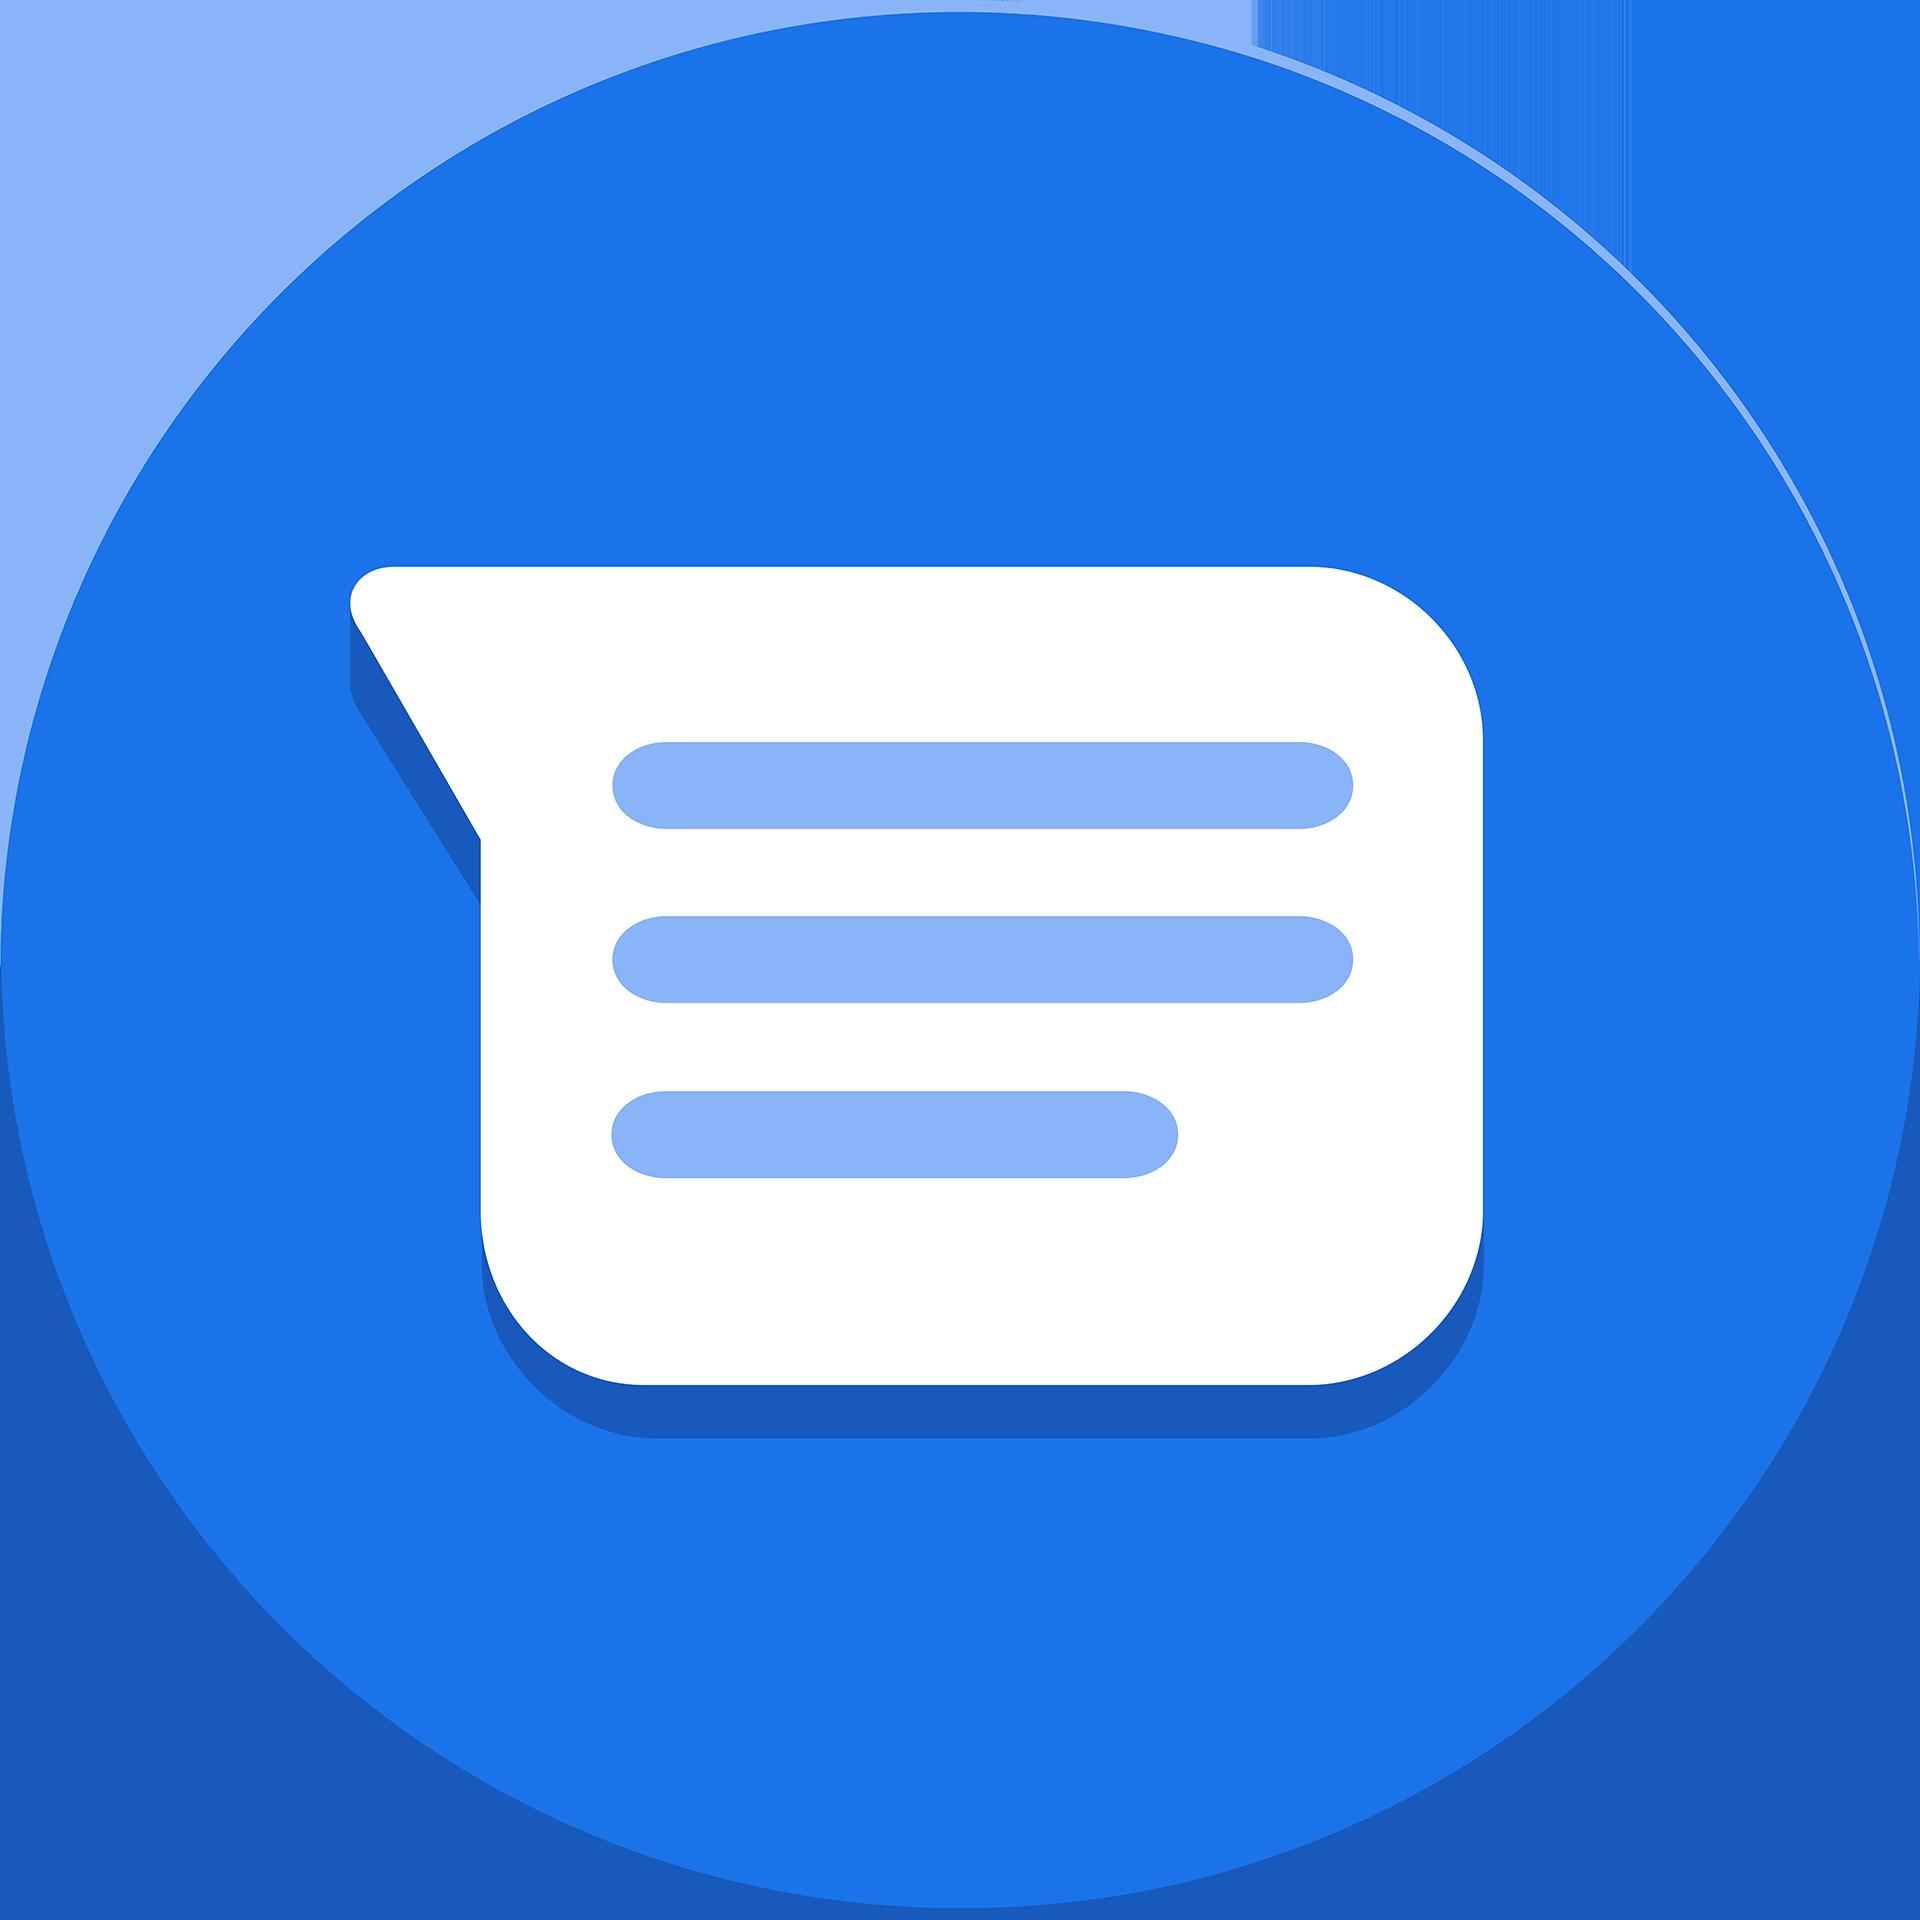 google-messages-logo.png